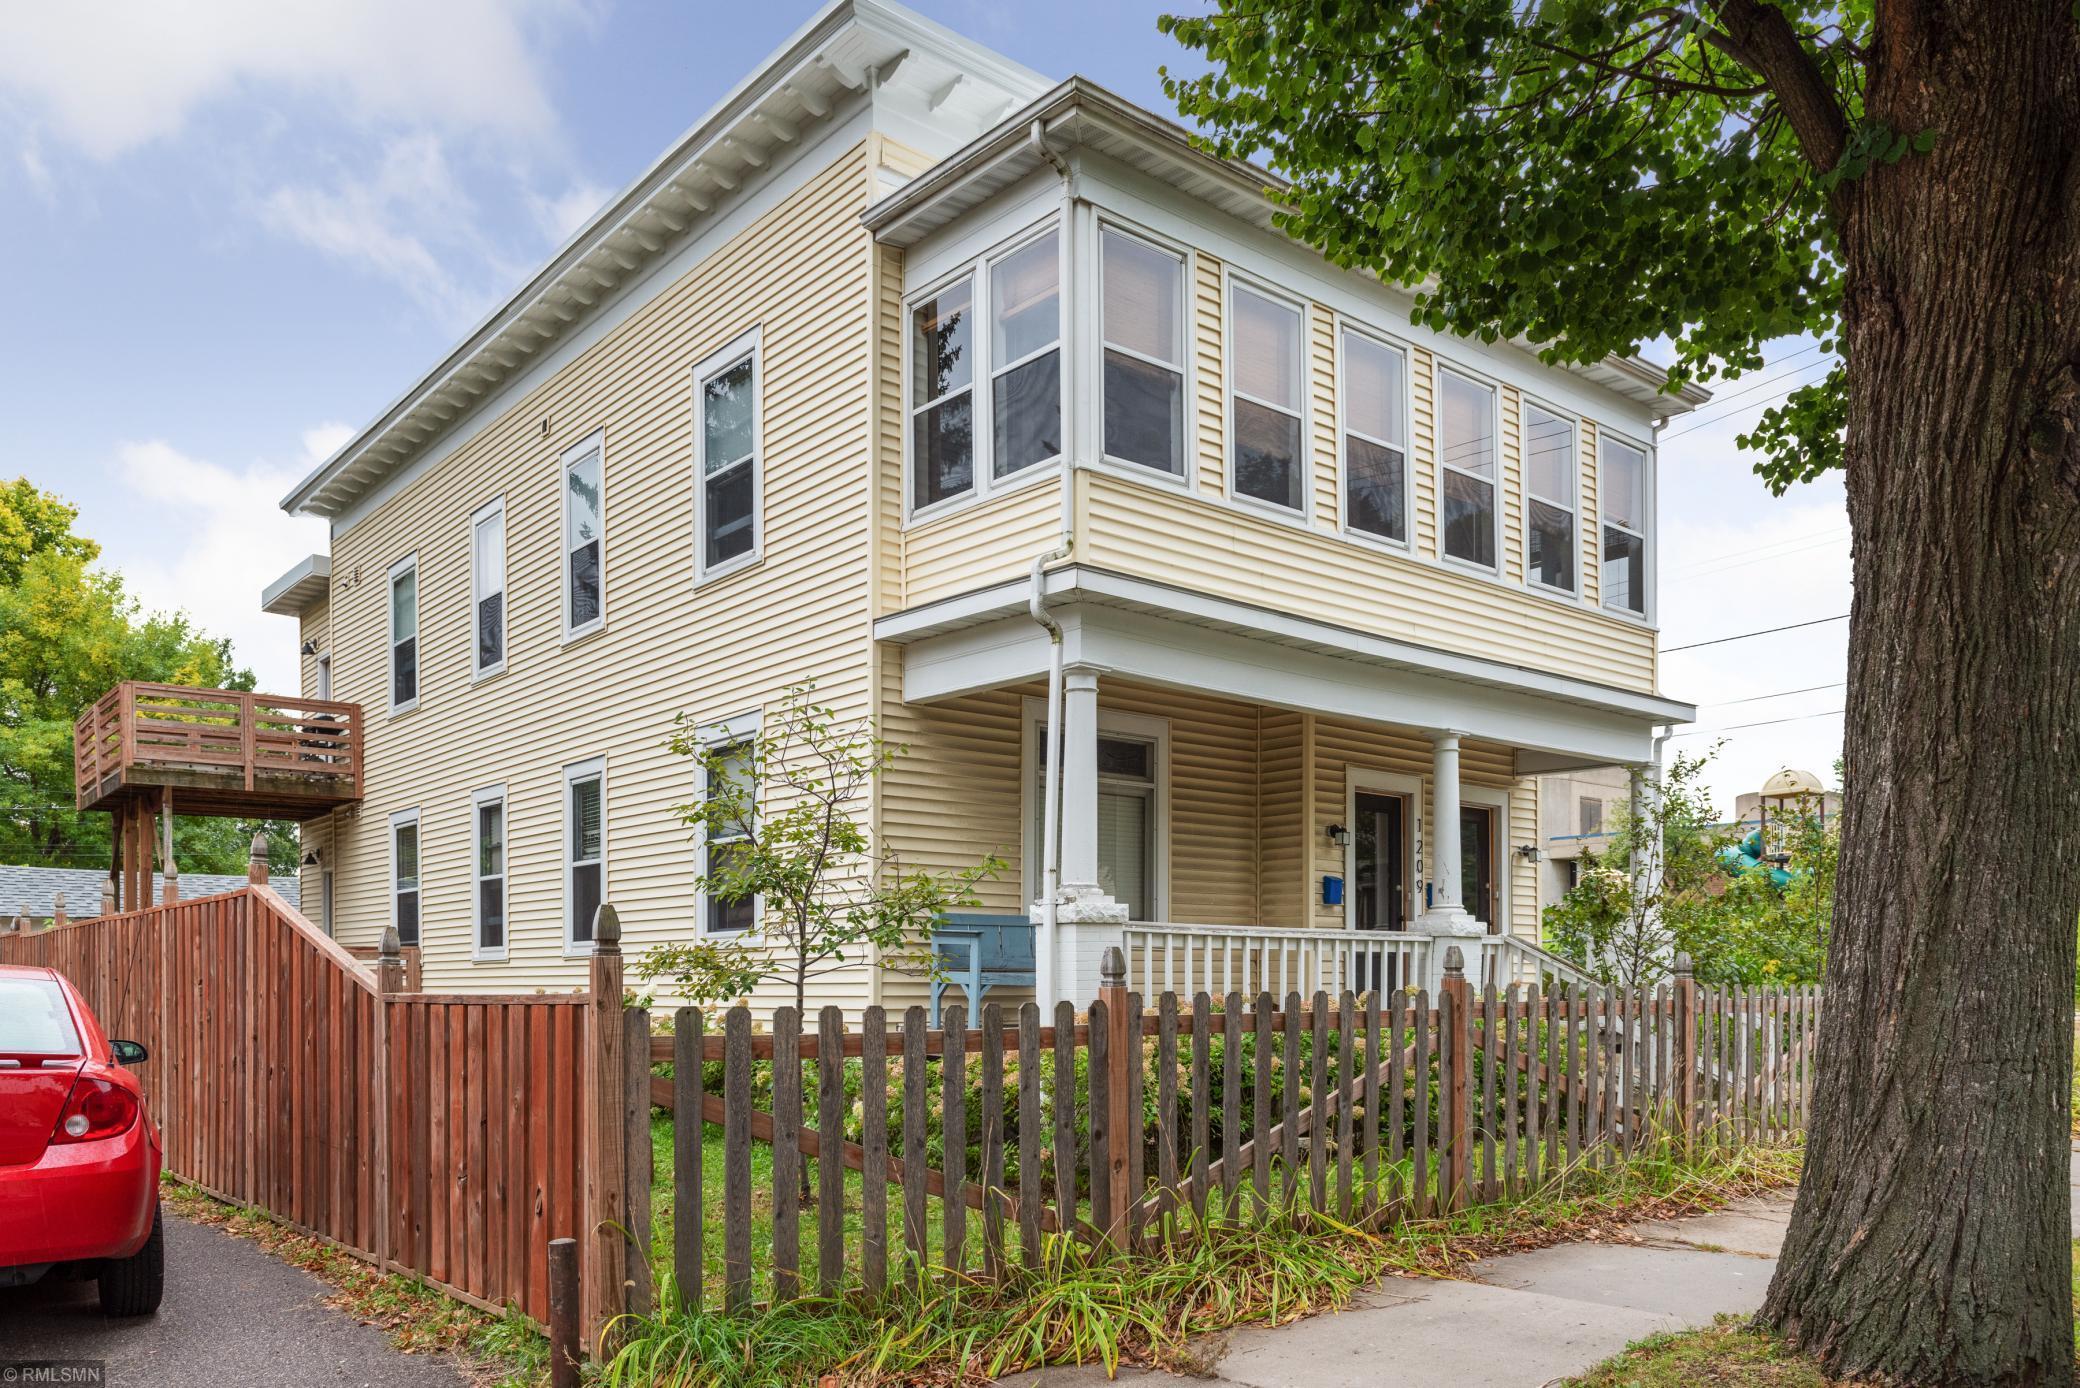 1209 25th Avenue N Property Photo - Minneapolis, MN real estate listing